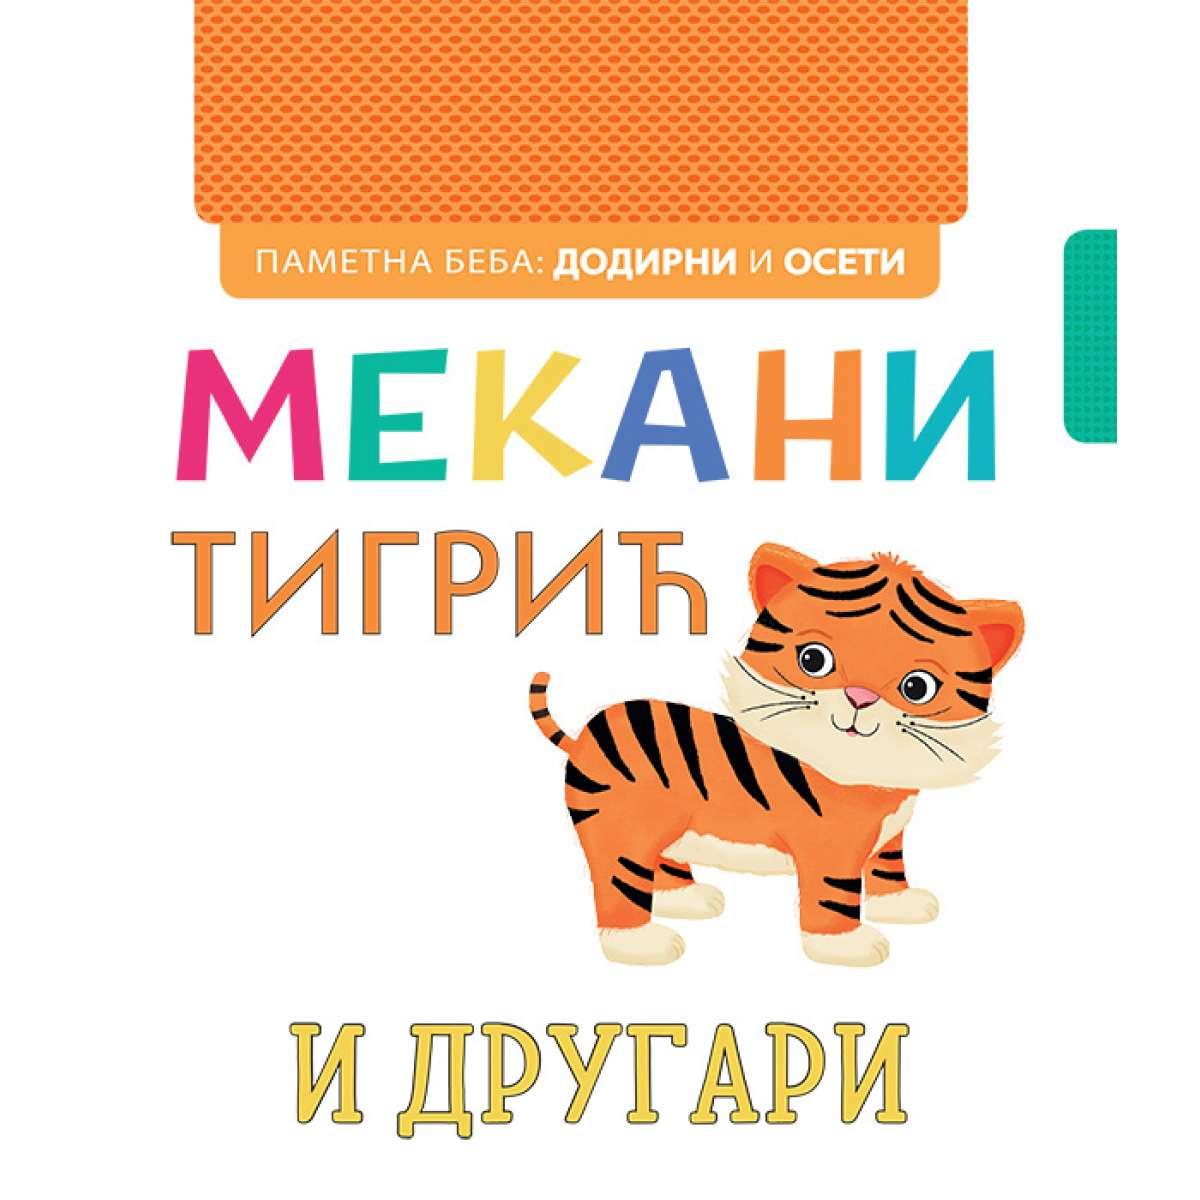 Pametna beba: Dodirni i oseti: Mekani tigrić i drugari